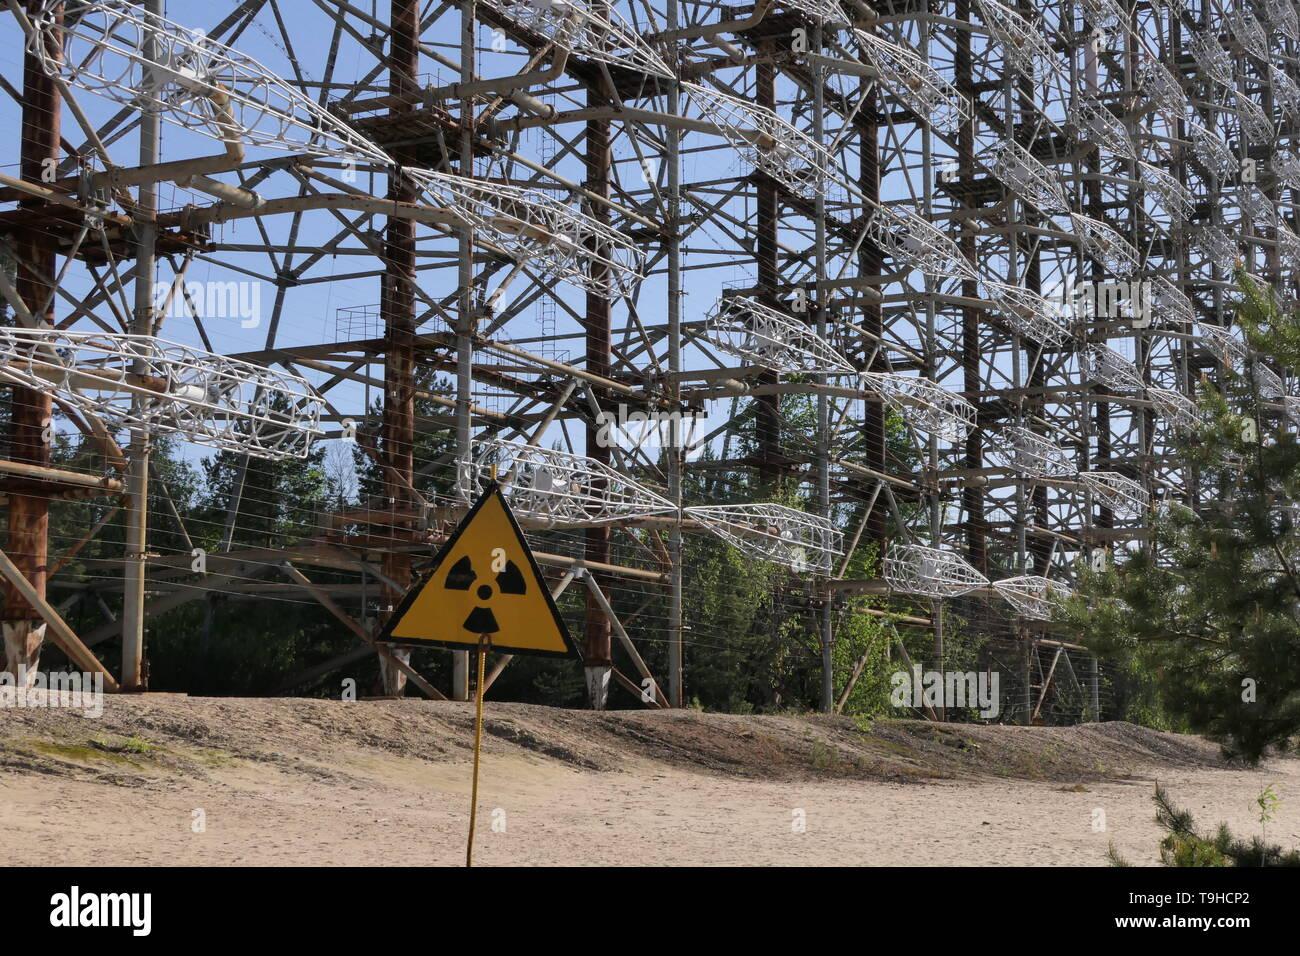 Duga 3 Soviet Radar Woodpecker System with radioactive hazard sign, Chernobyl exclusion zone, Ukraine - Stock Image